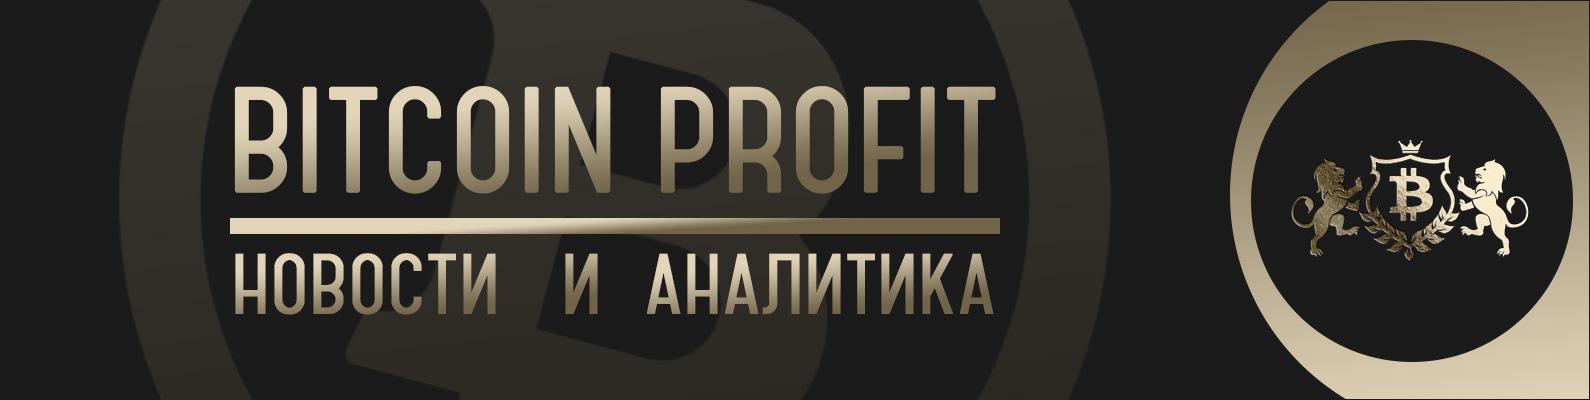 bitcoin profit w tvn